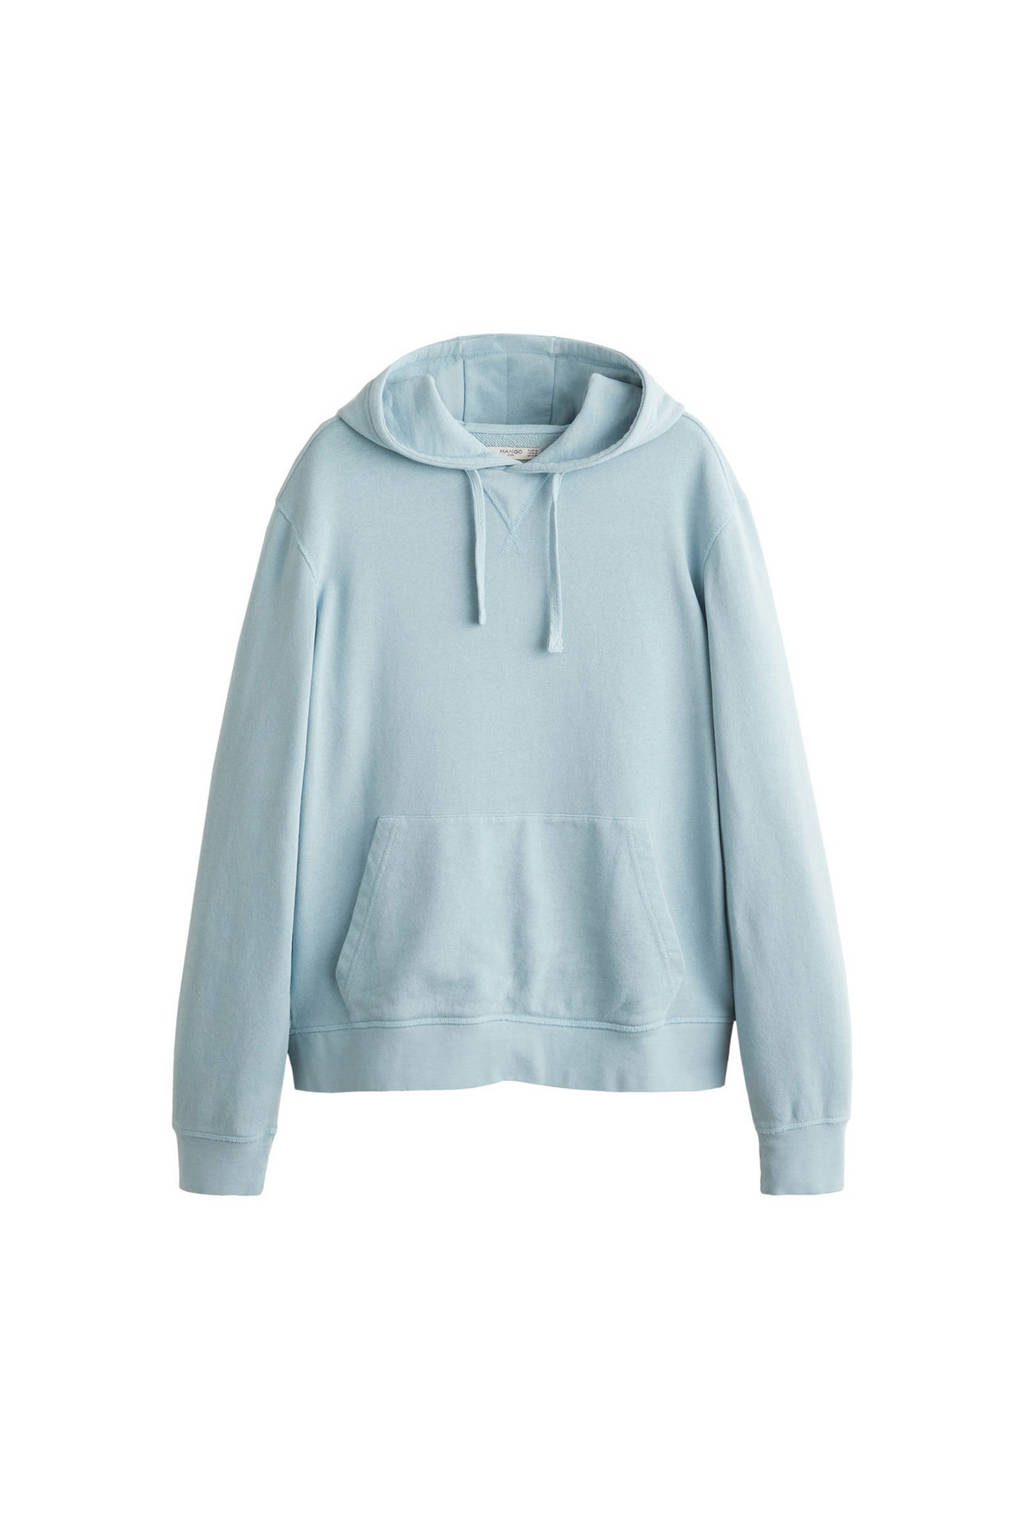 Mango Man hoodie, pastelblauw